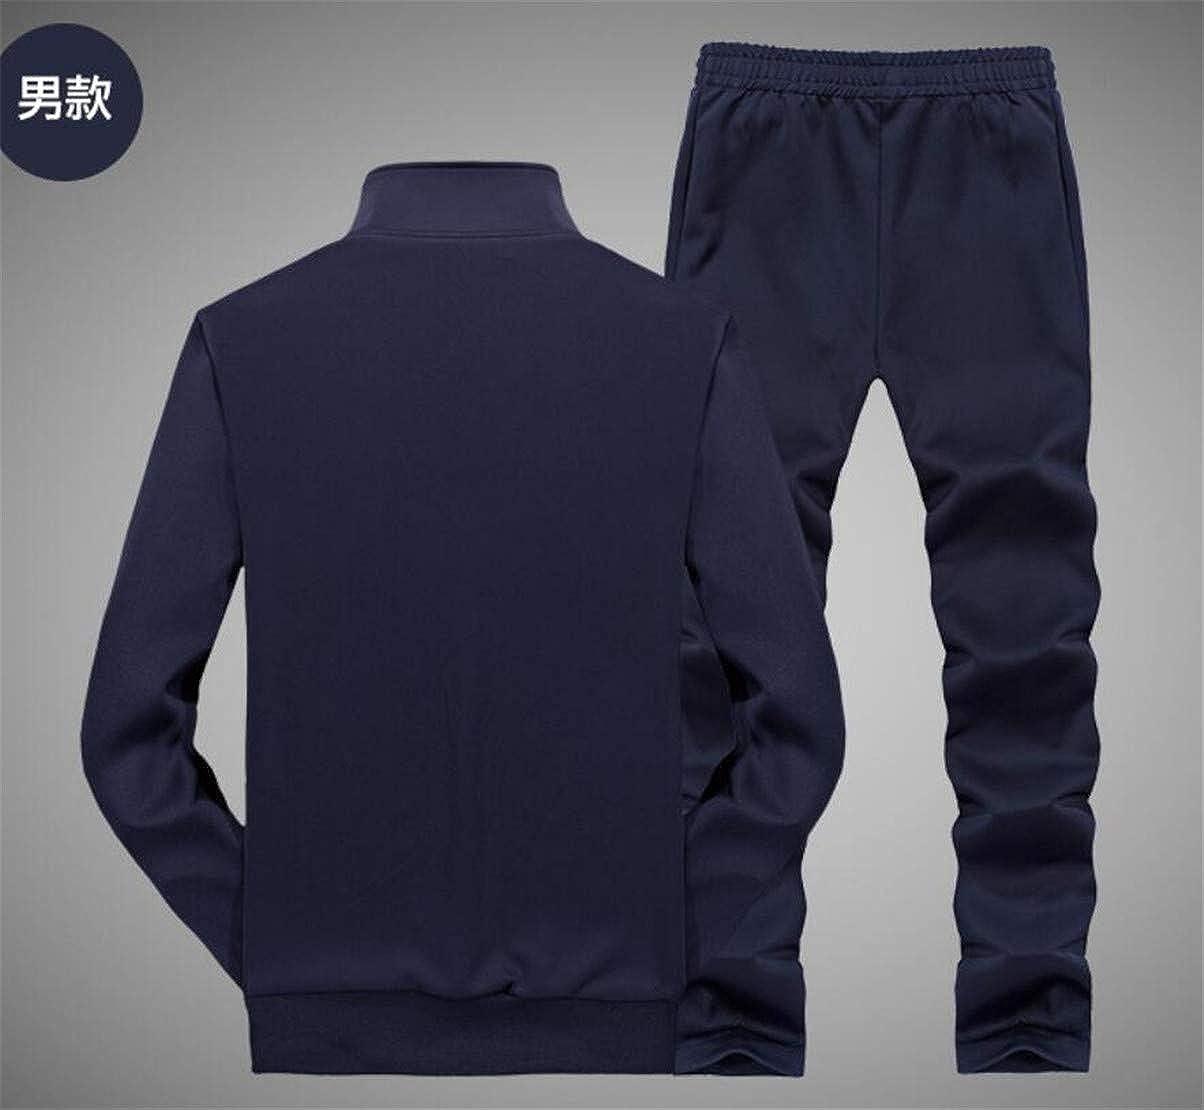 Spirio Men Stand Collar Jacket Two Pieces Sport Pants Tracksuit Sweatsuit Set